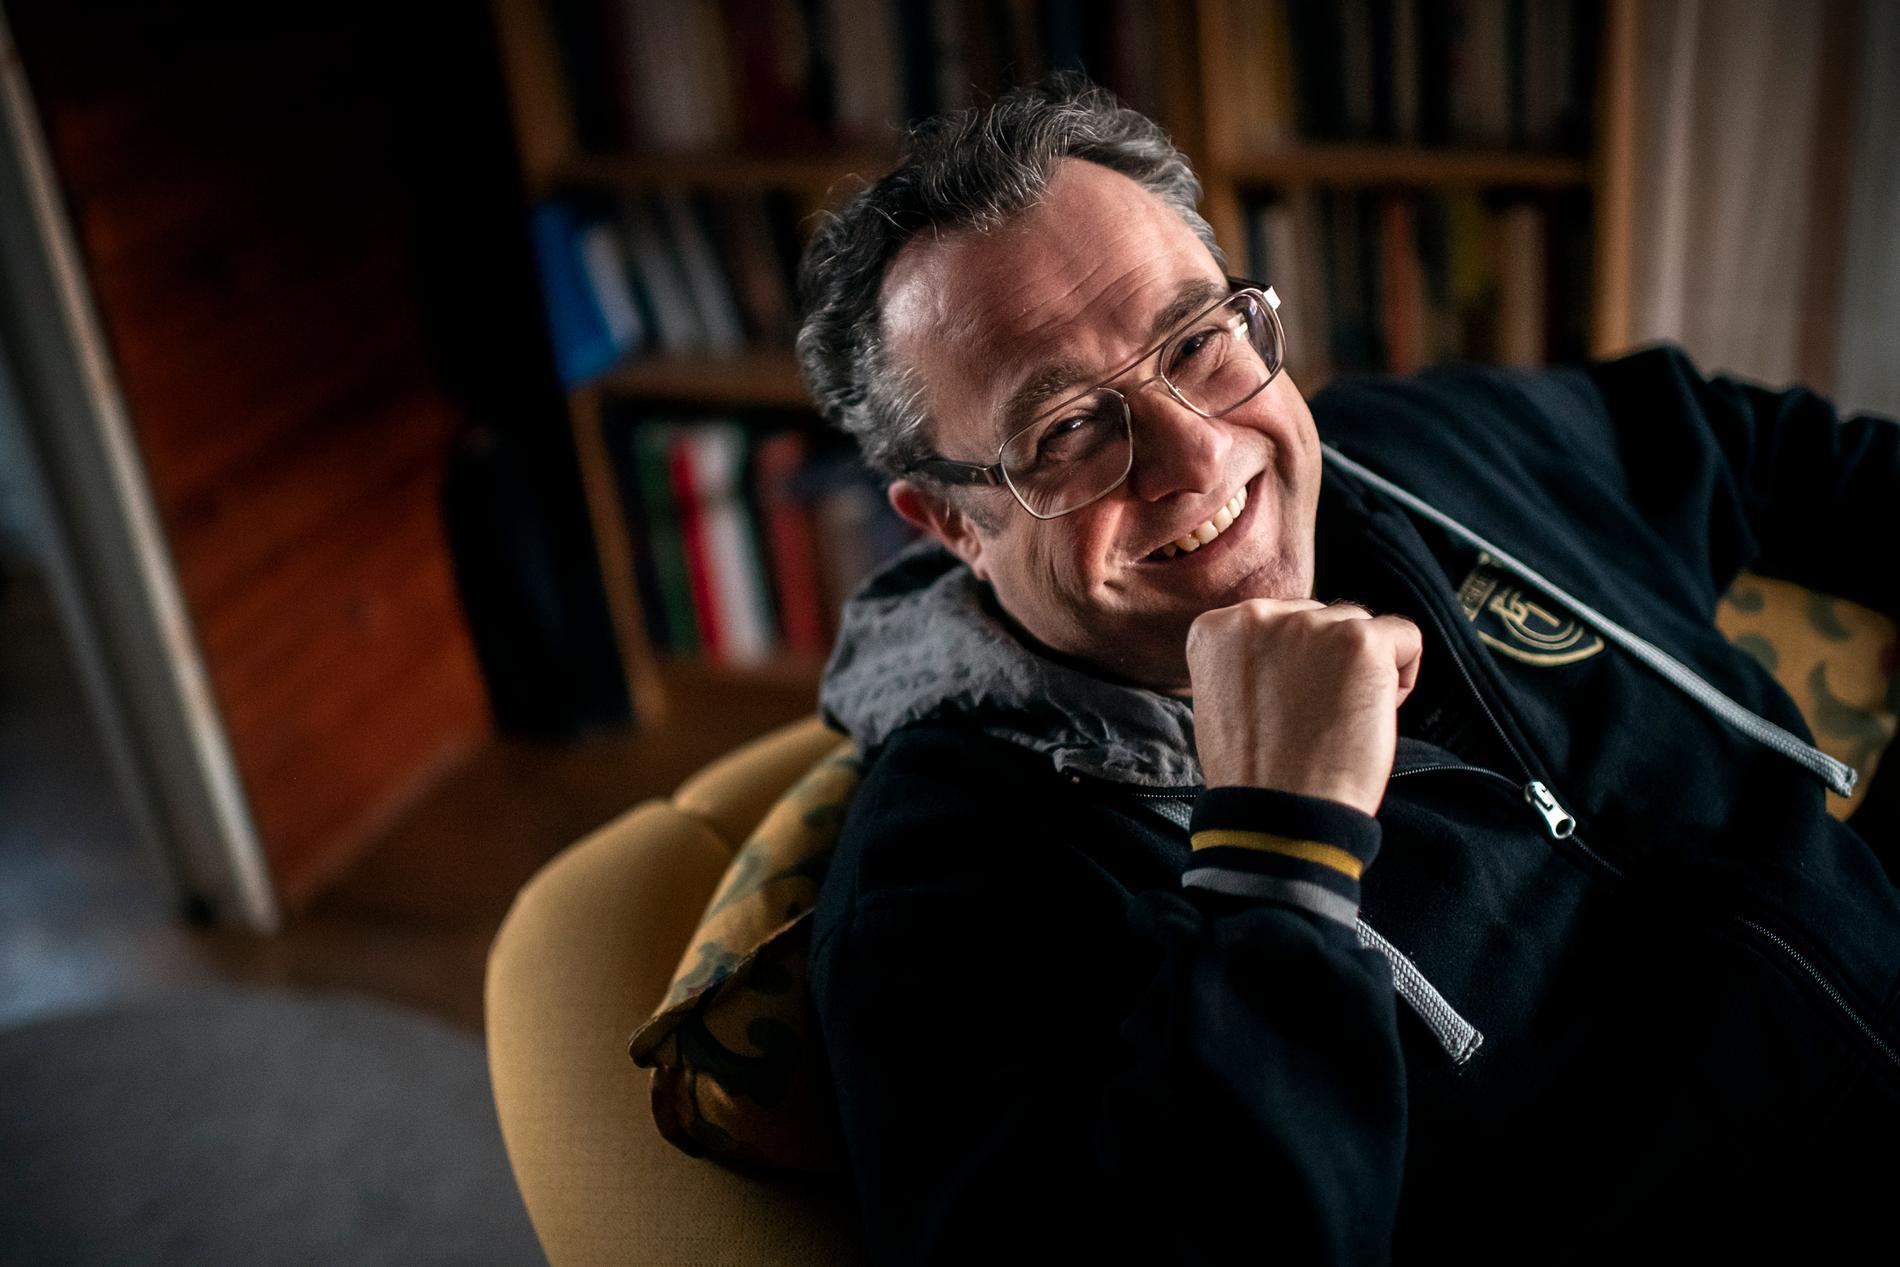 Degerfors ordförande Fredrik Rakar.